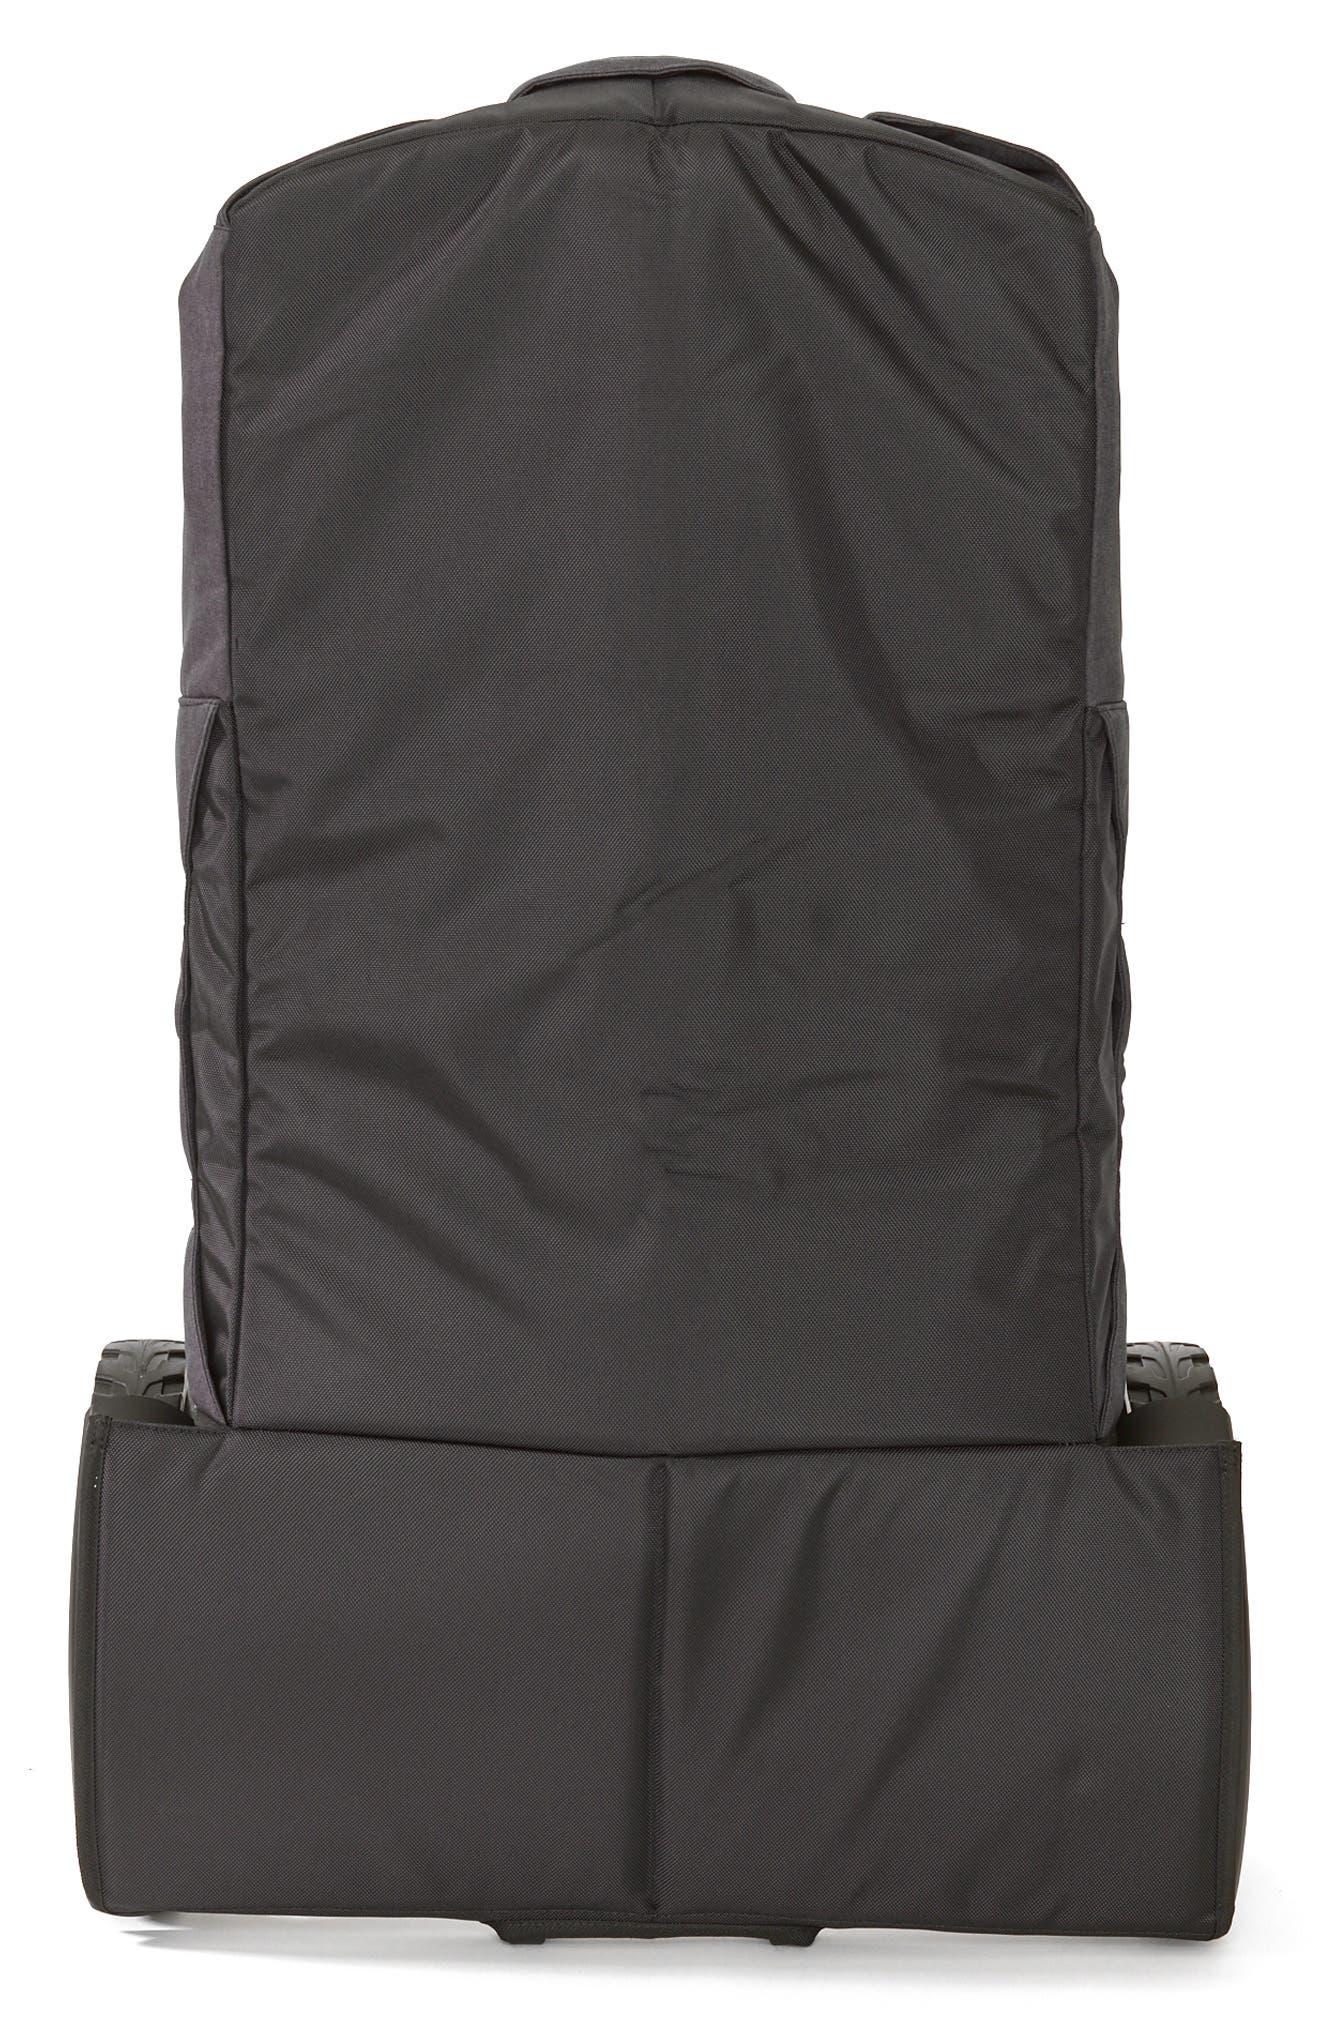 Cruiser Travel Bag,                         Main,                         color, BLACK